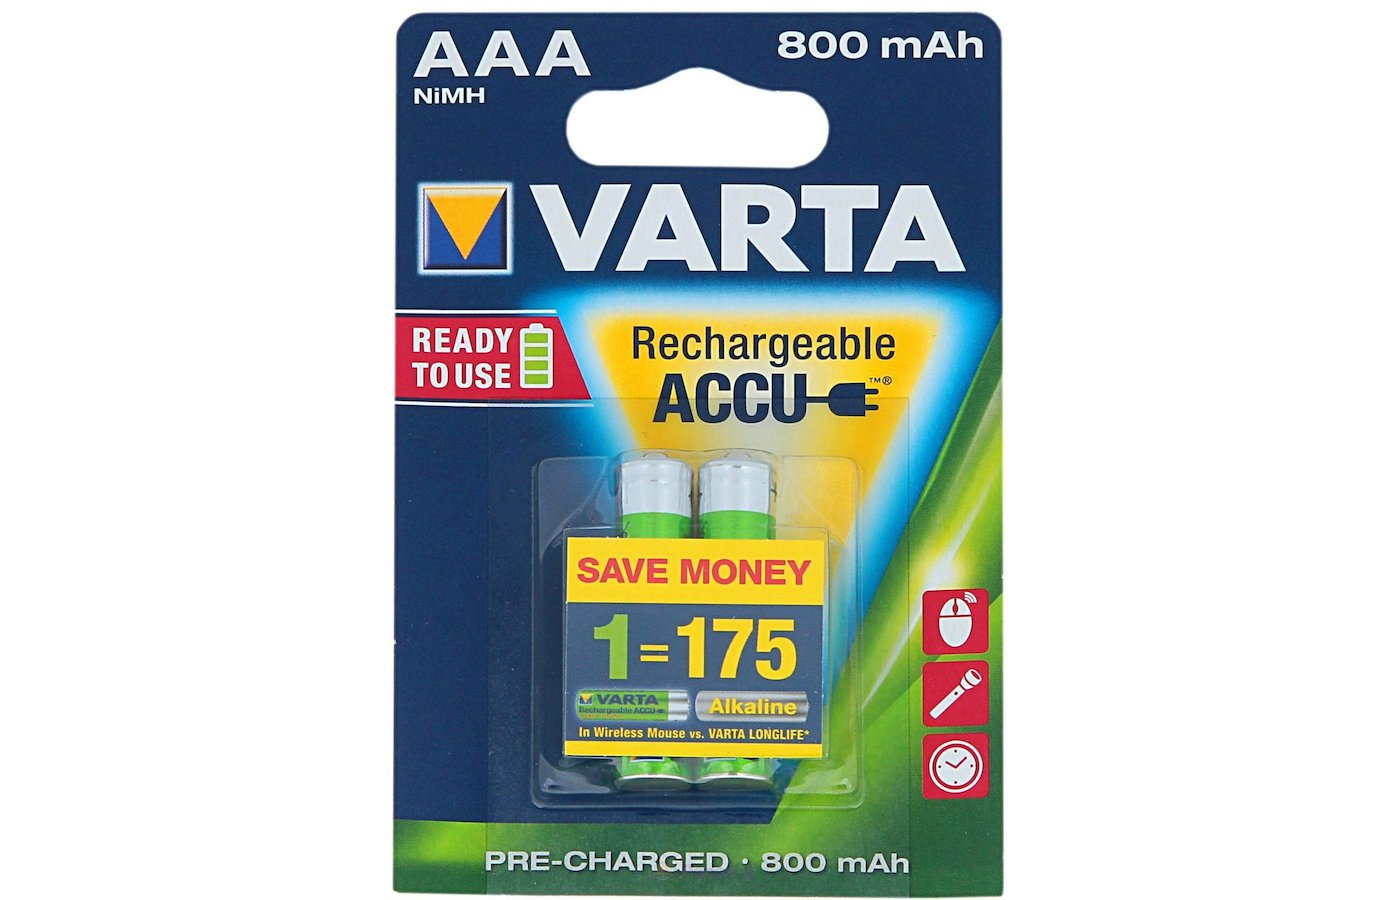 Аккумулятор VARTA AAA 800mAh Ni-Mh 2шт.